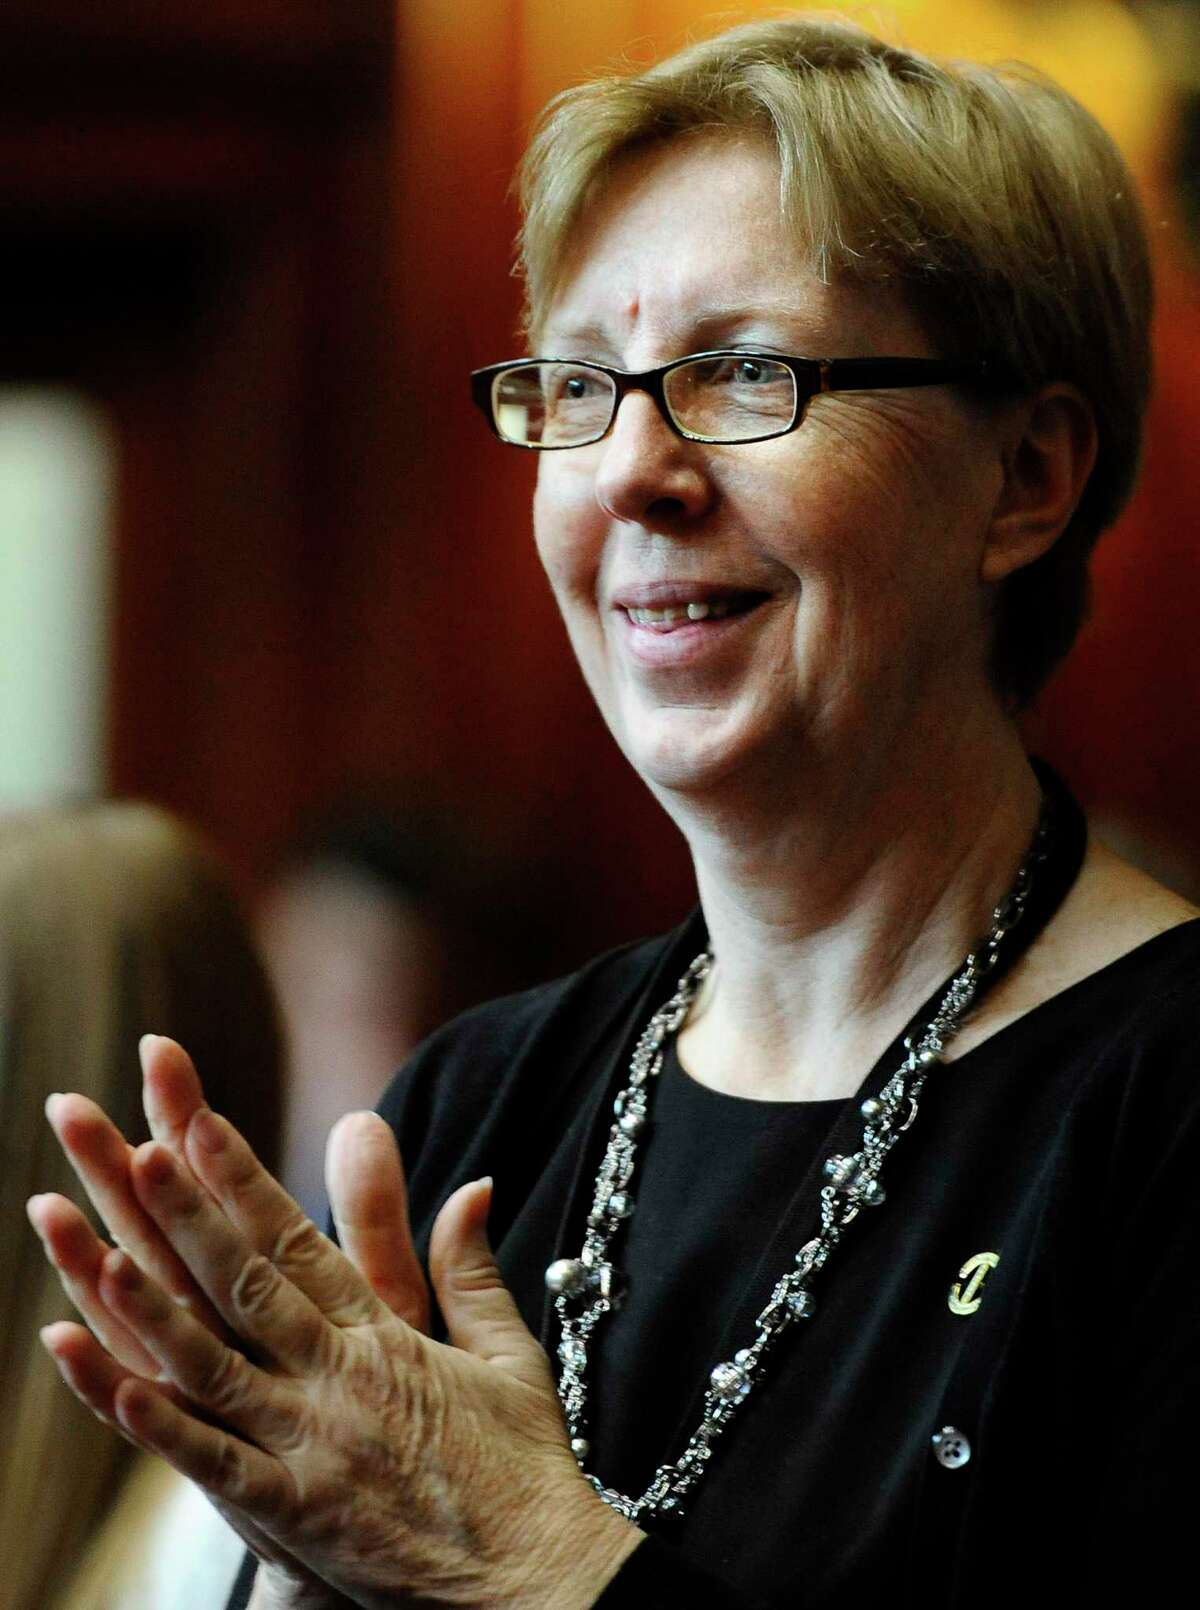 State Sen. Cathy Osten, D-Sprague, co-chairwoman of the legislative Public Safety Committee.